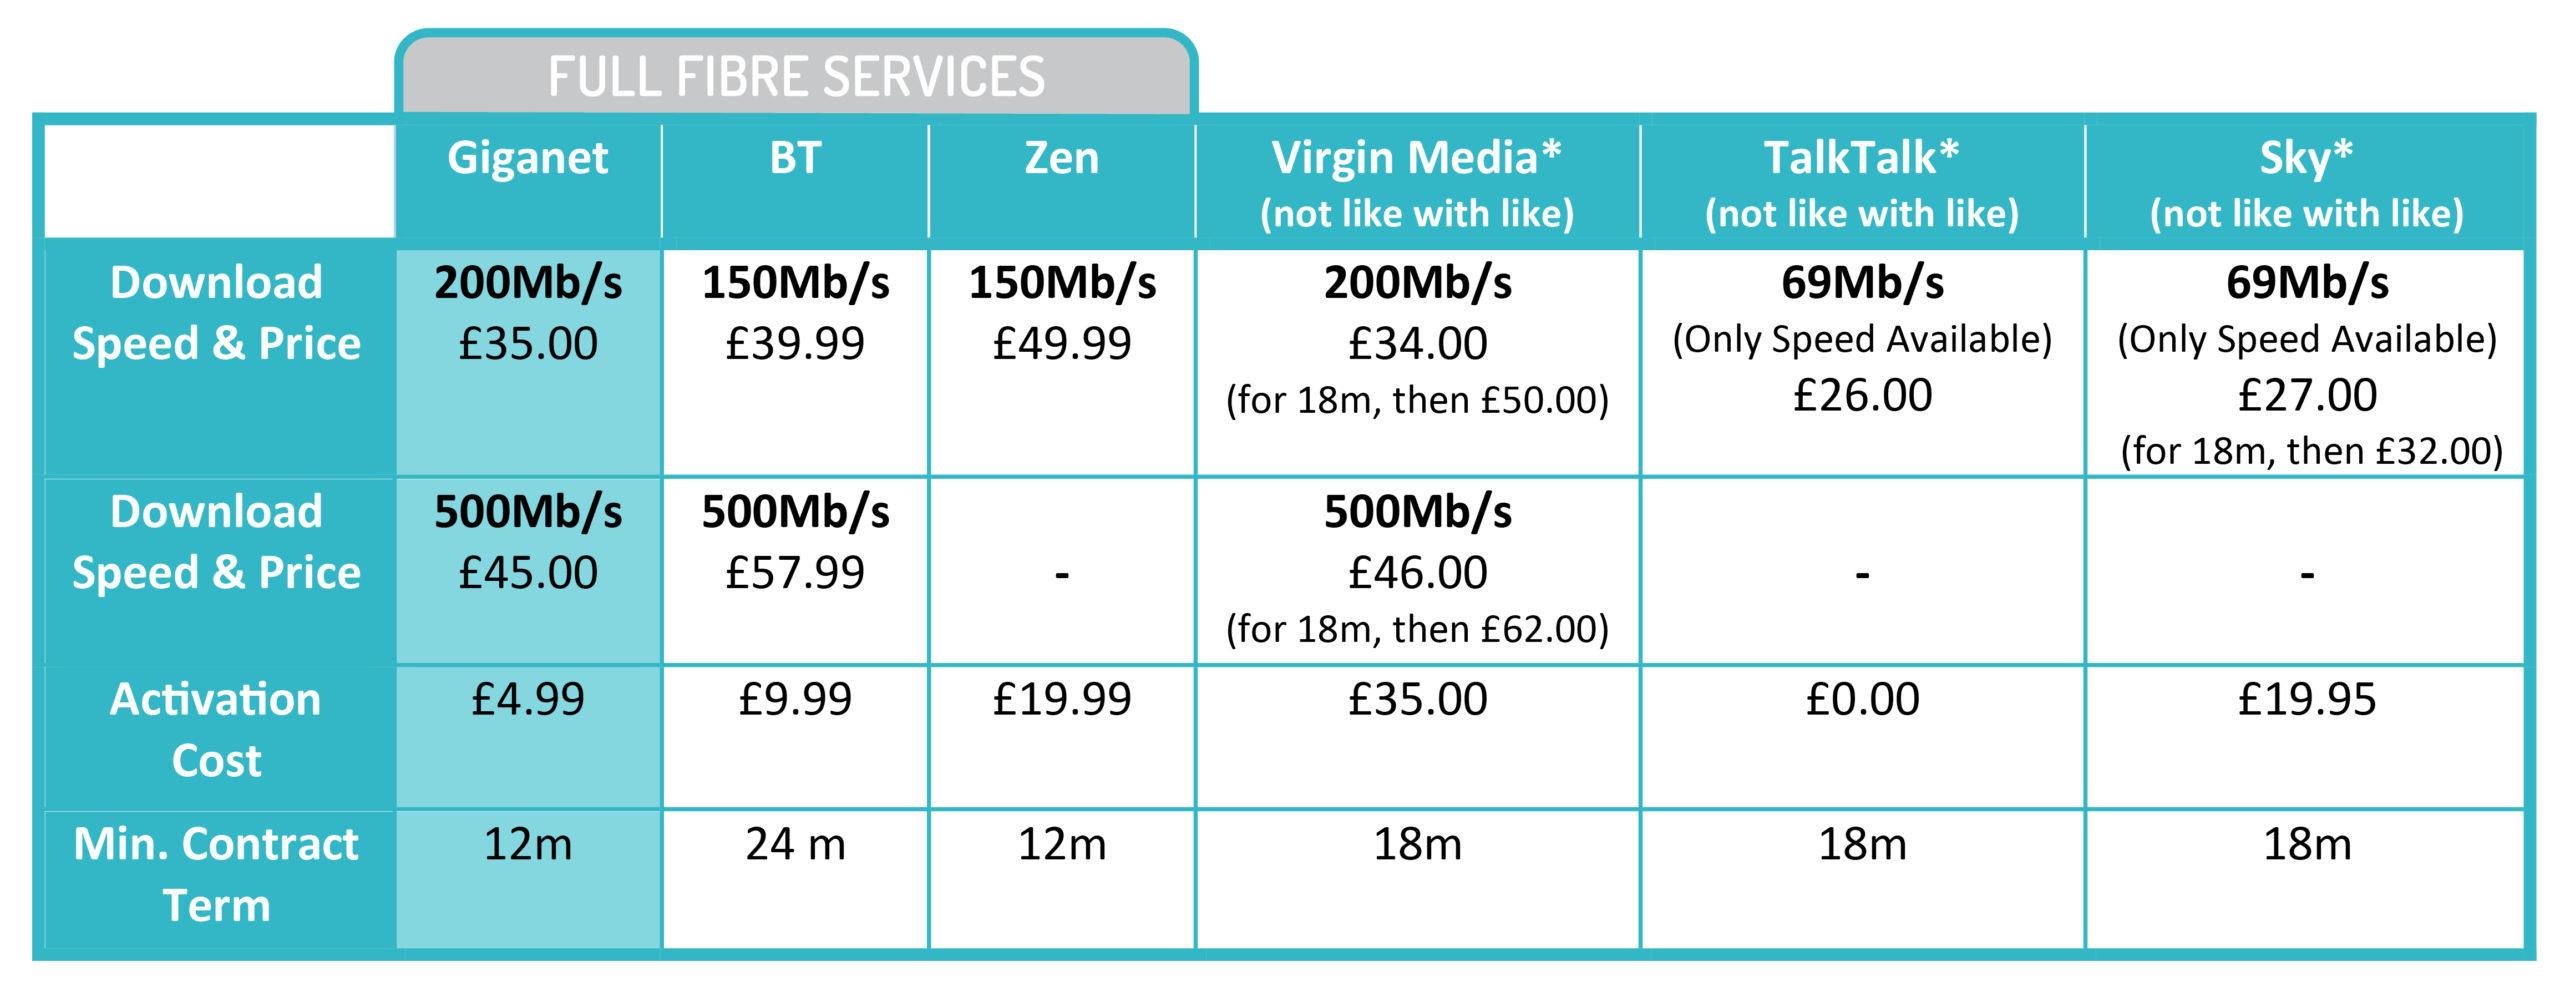 Salisbury Pricing Comparison